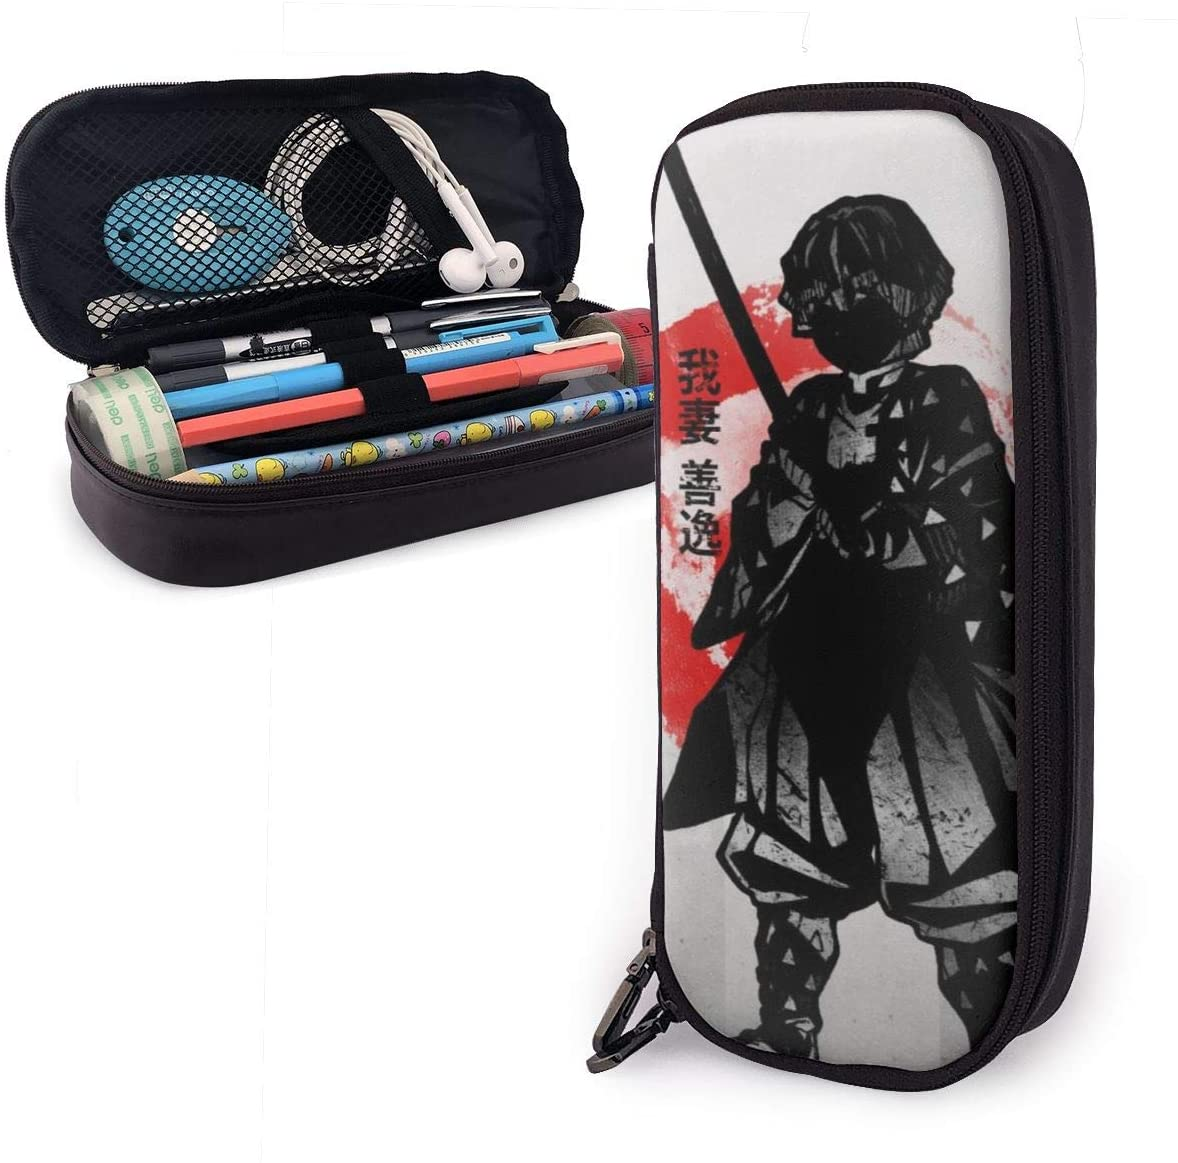 Demon Slayer Big Capacity Pencil Case, Children Pen Marker Holder Pouch Box, Women Makeup Bag, Stationery Organizer with Zipper for Boys Girls School Office